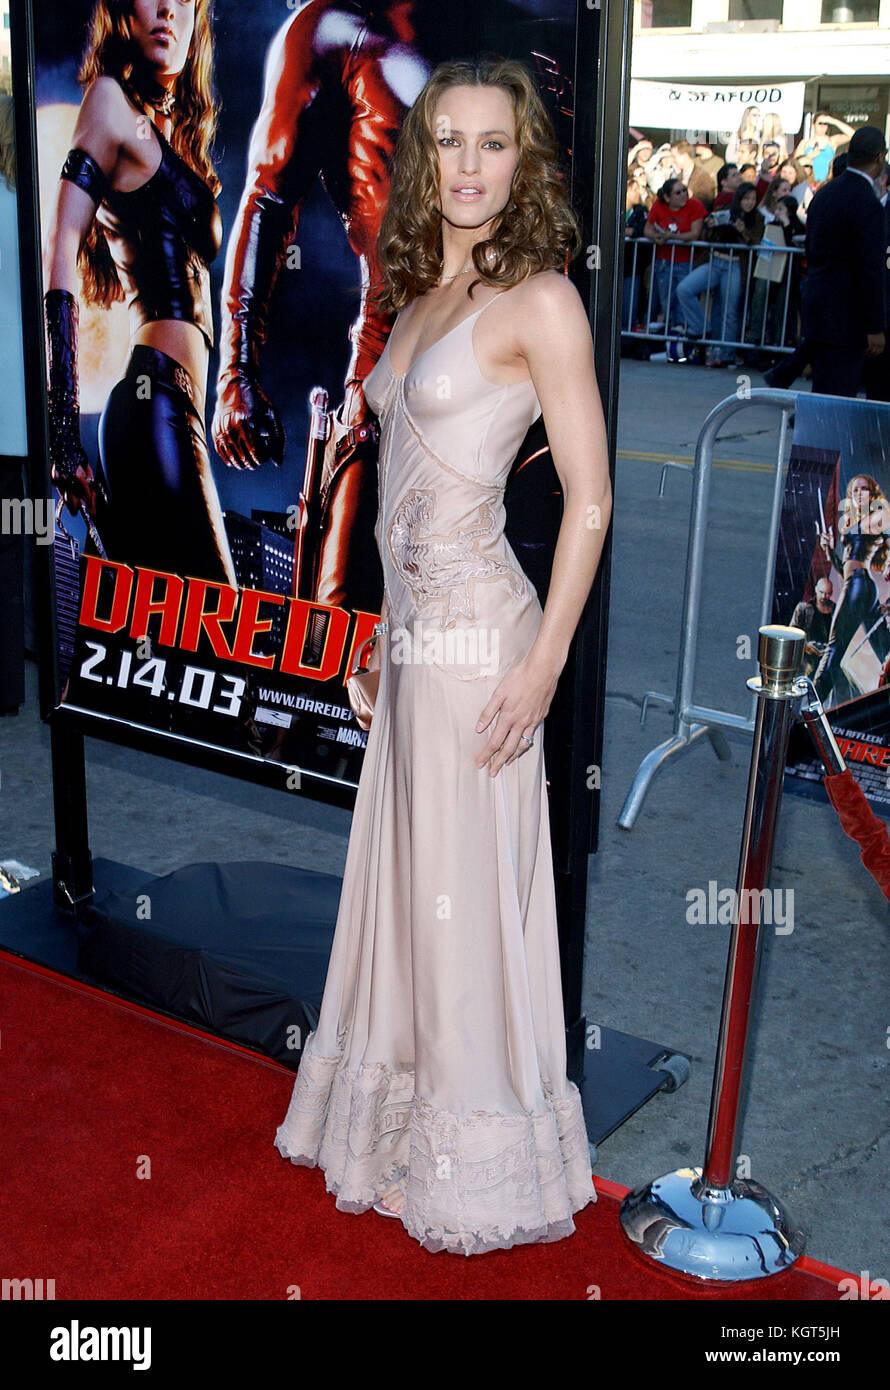 Jennifer Garner Daredevil Premiere The gallery for -->...